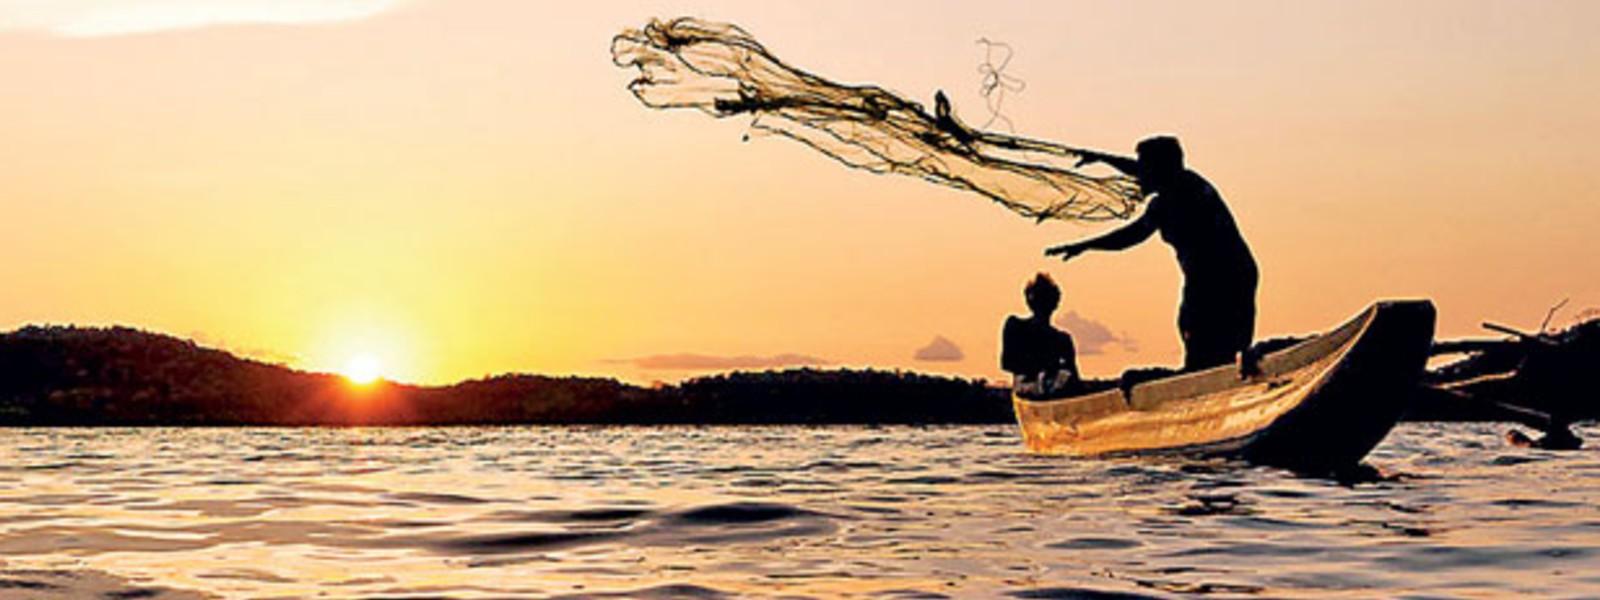 SRI LANKA AND INDIA DISCUSS FISHING WARS